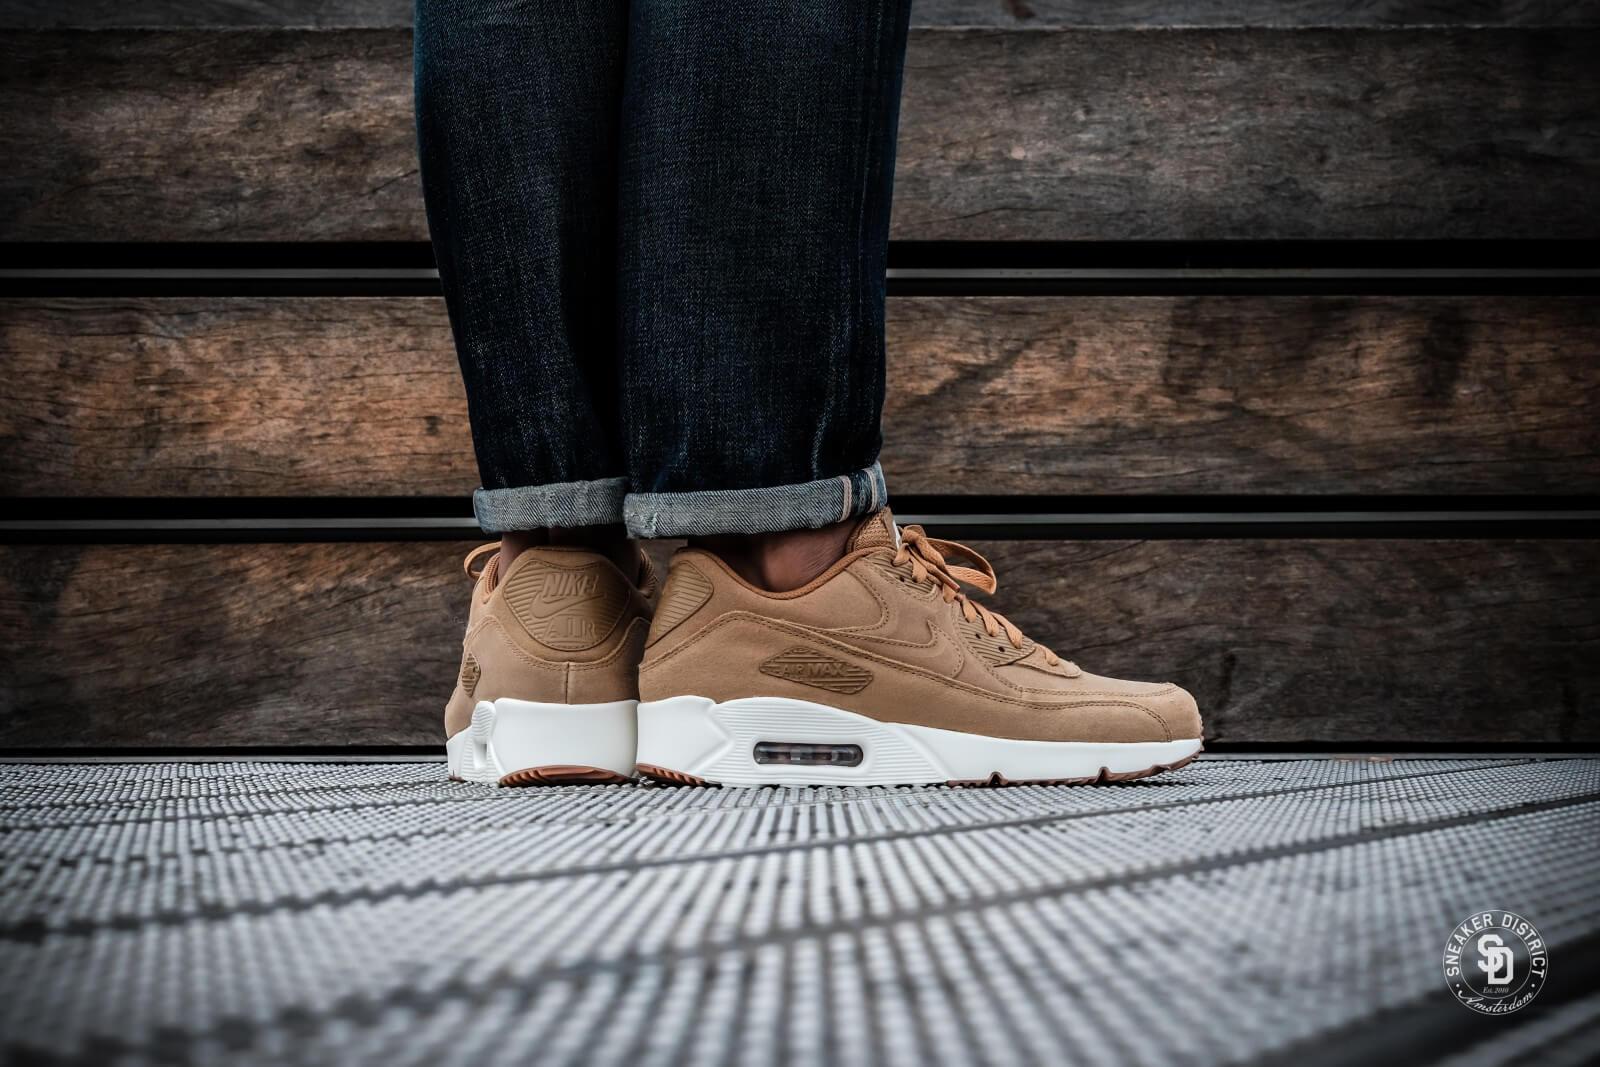 Nike Air Max 90 Ultra 2.0 Leather Flax Herre Sneakers